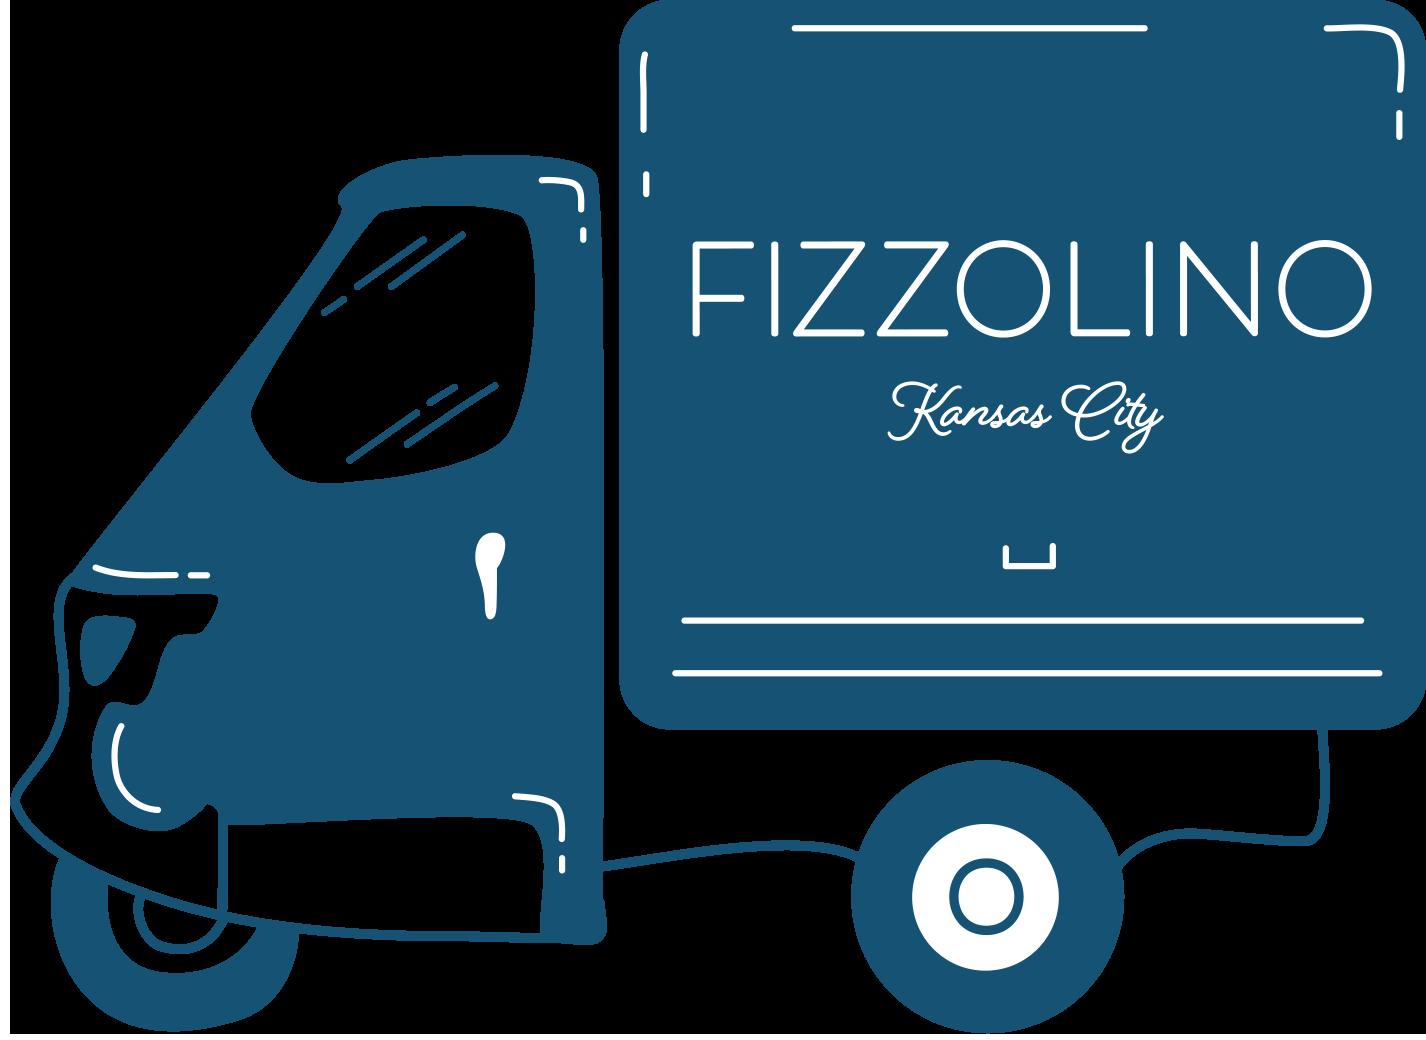 Kansas City Fizzolino